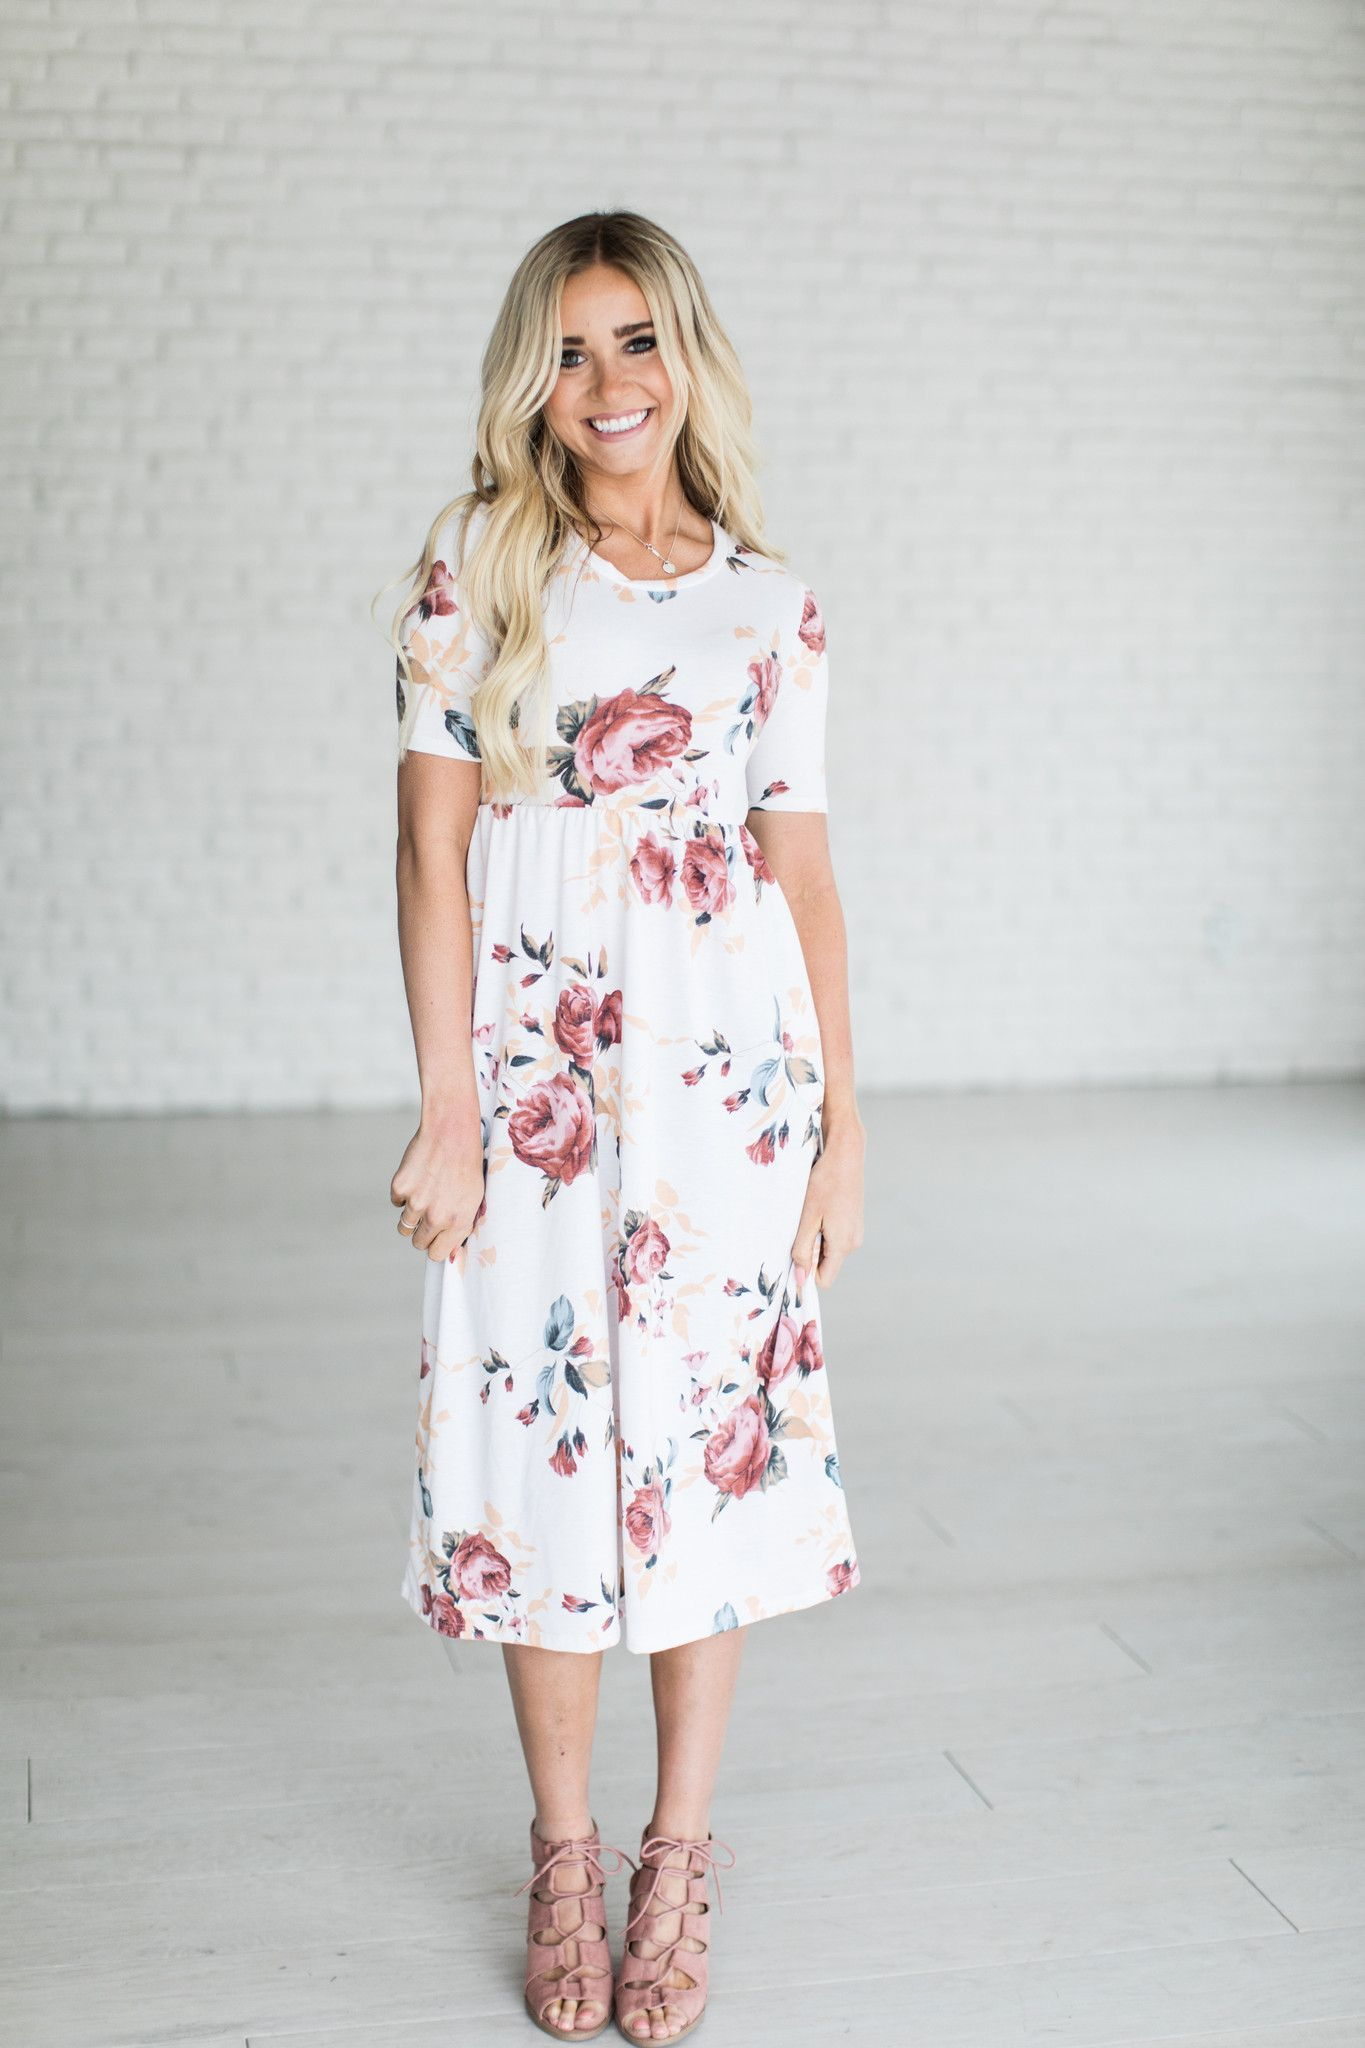 1027361c3b1 Casual Short Sleeve Pocket Design White Floral Dress